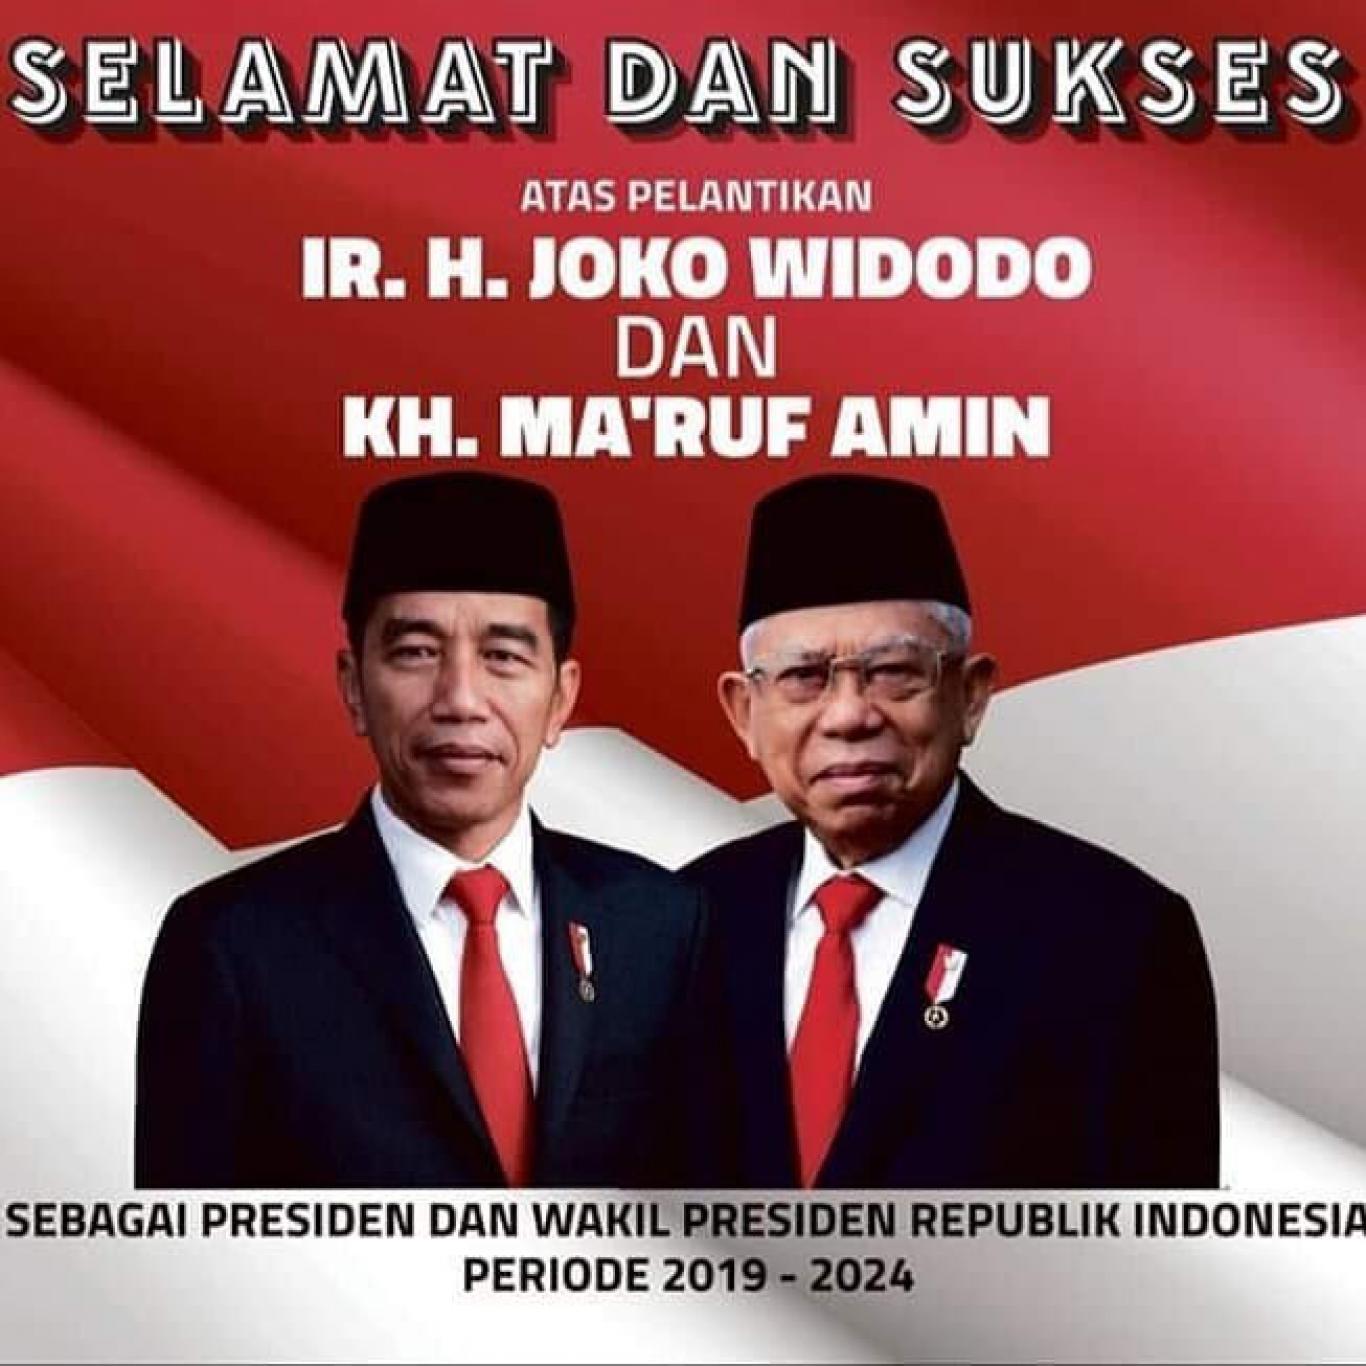 Selamat Atas Dilantiknya Presiden Dan Wakil Presiden Ri Periode 2019 2024 Website Desa Bukti